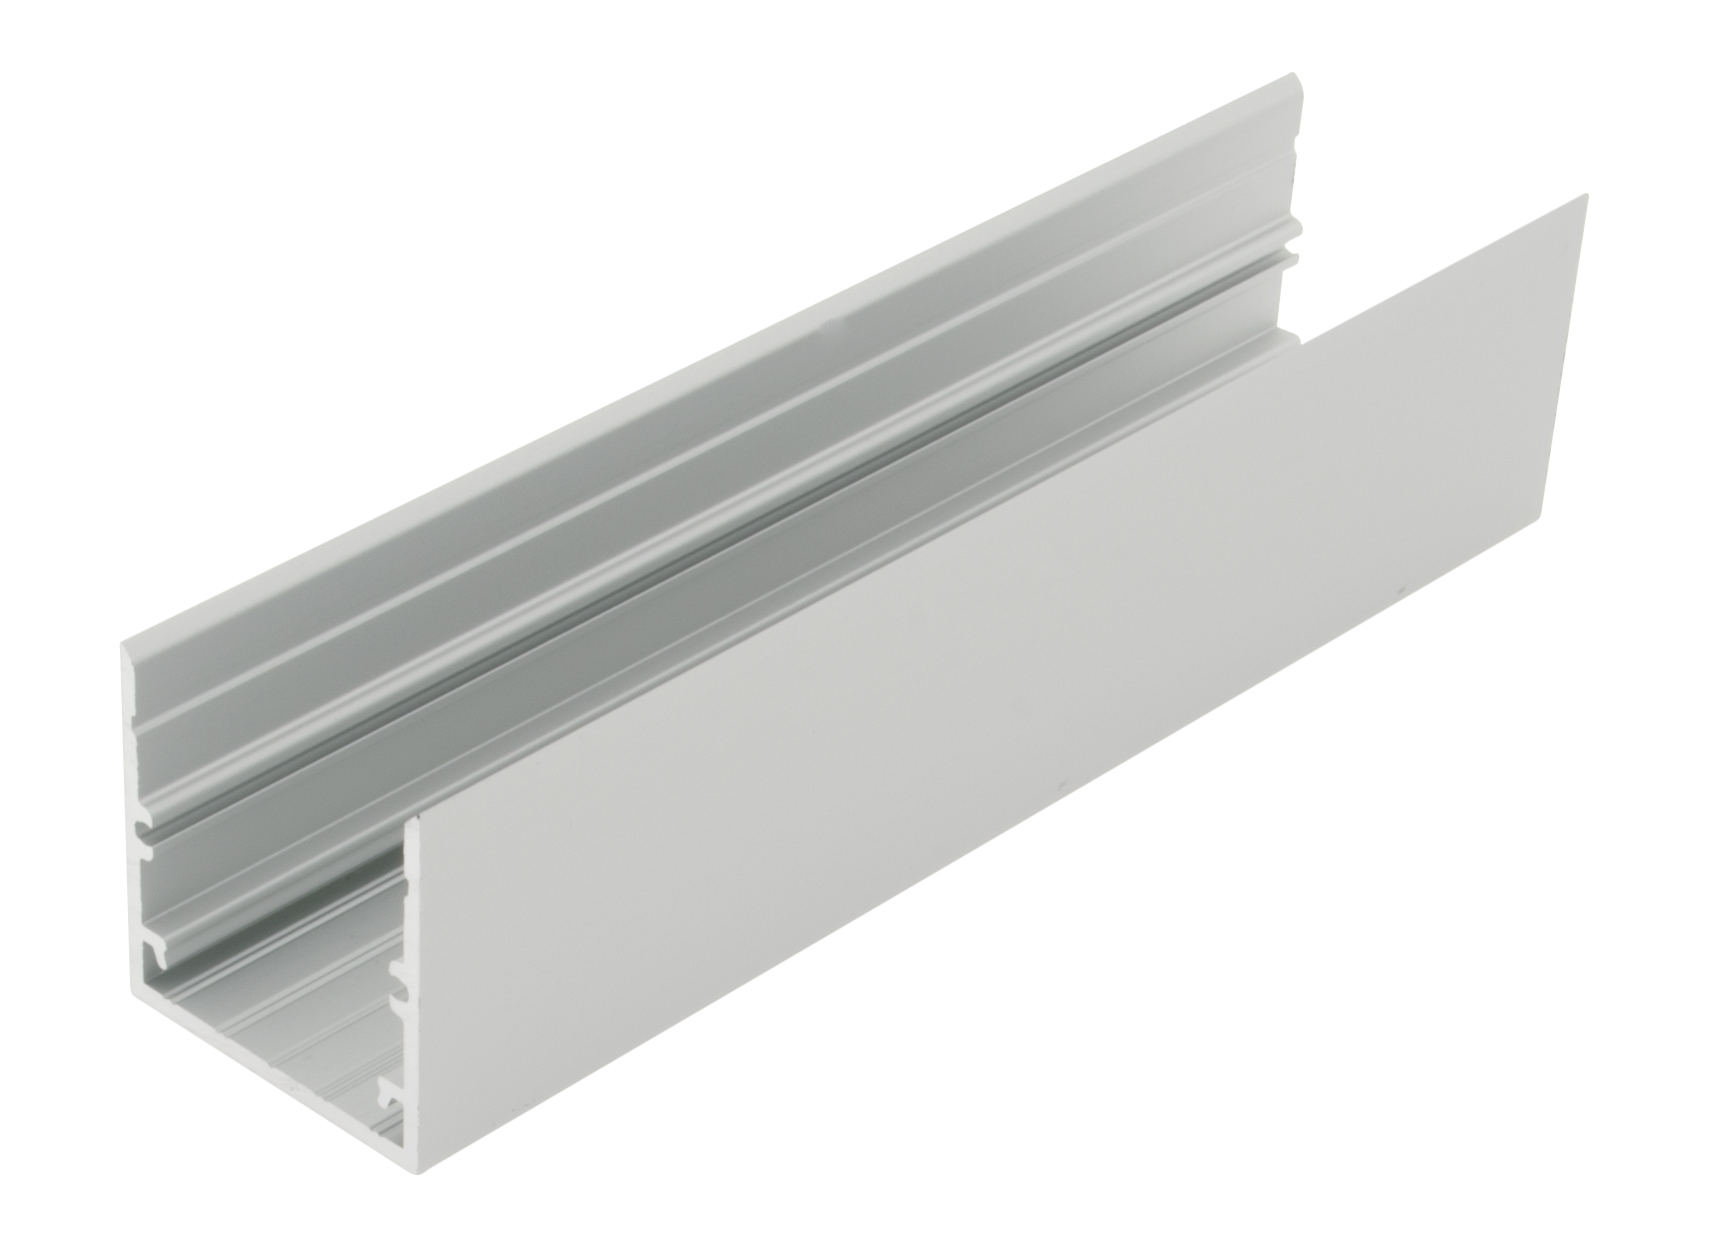 1 m Aluminium Profil CLR LIAP006002